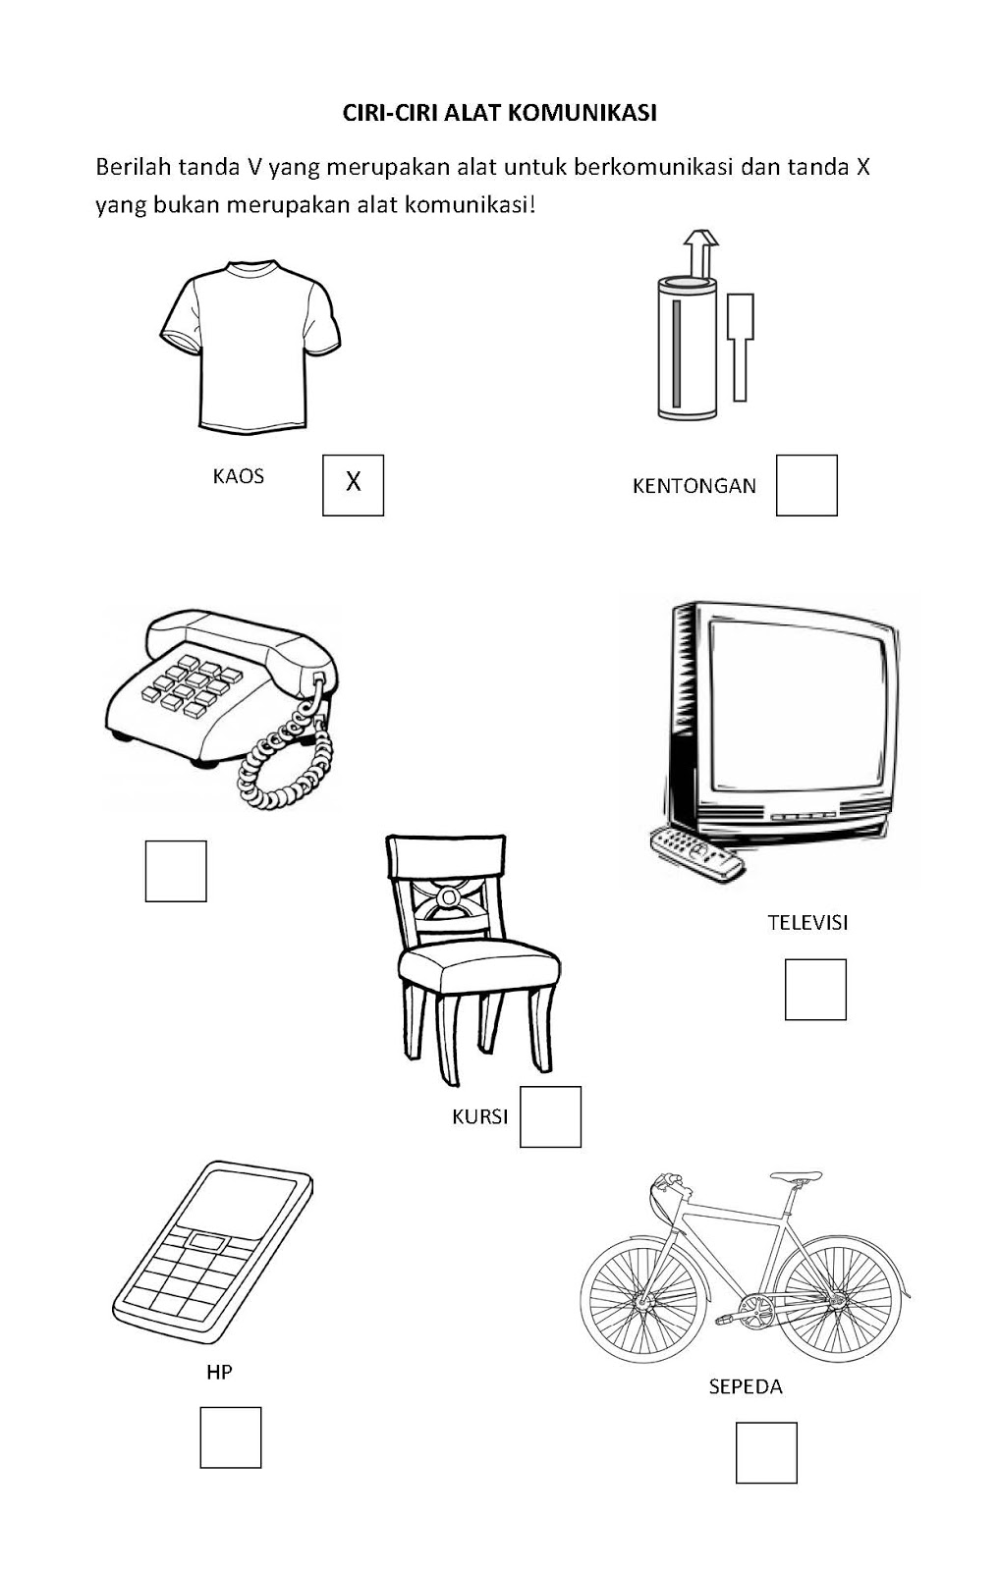 Contoh Gambar Alat Komunikasi : contoh, gambar, komunikasi, Mewarnai, Gambar, Komunikasi, Sukagambarku, Komunikasi,, Kegiatan, Sekolah